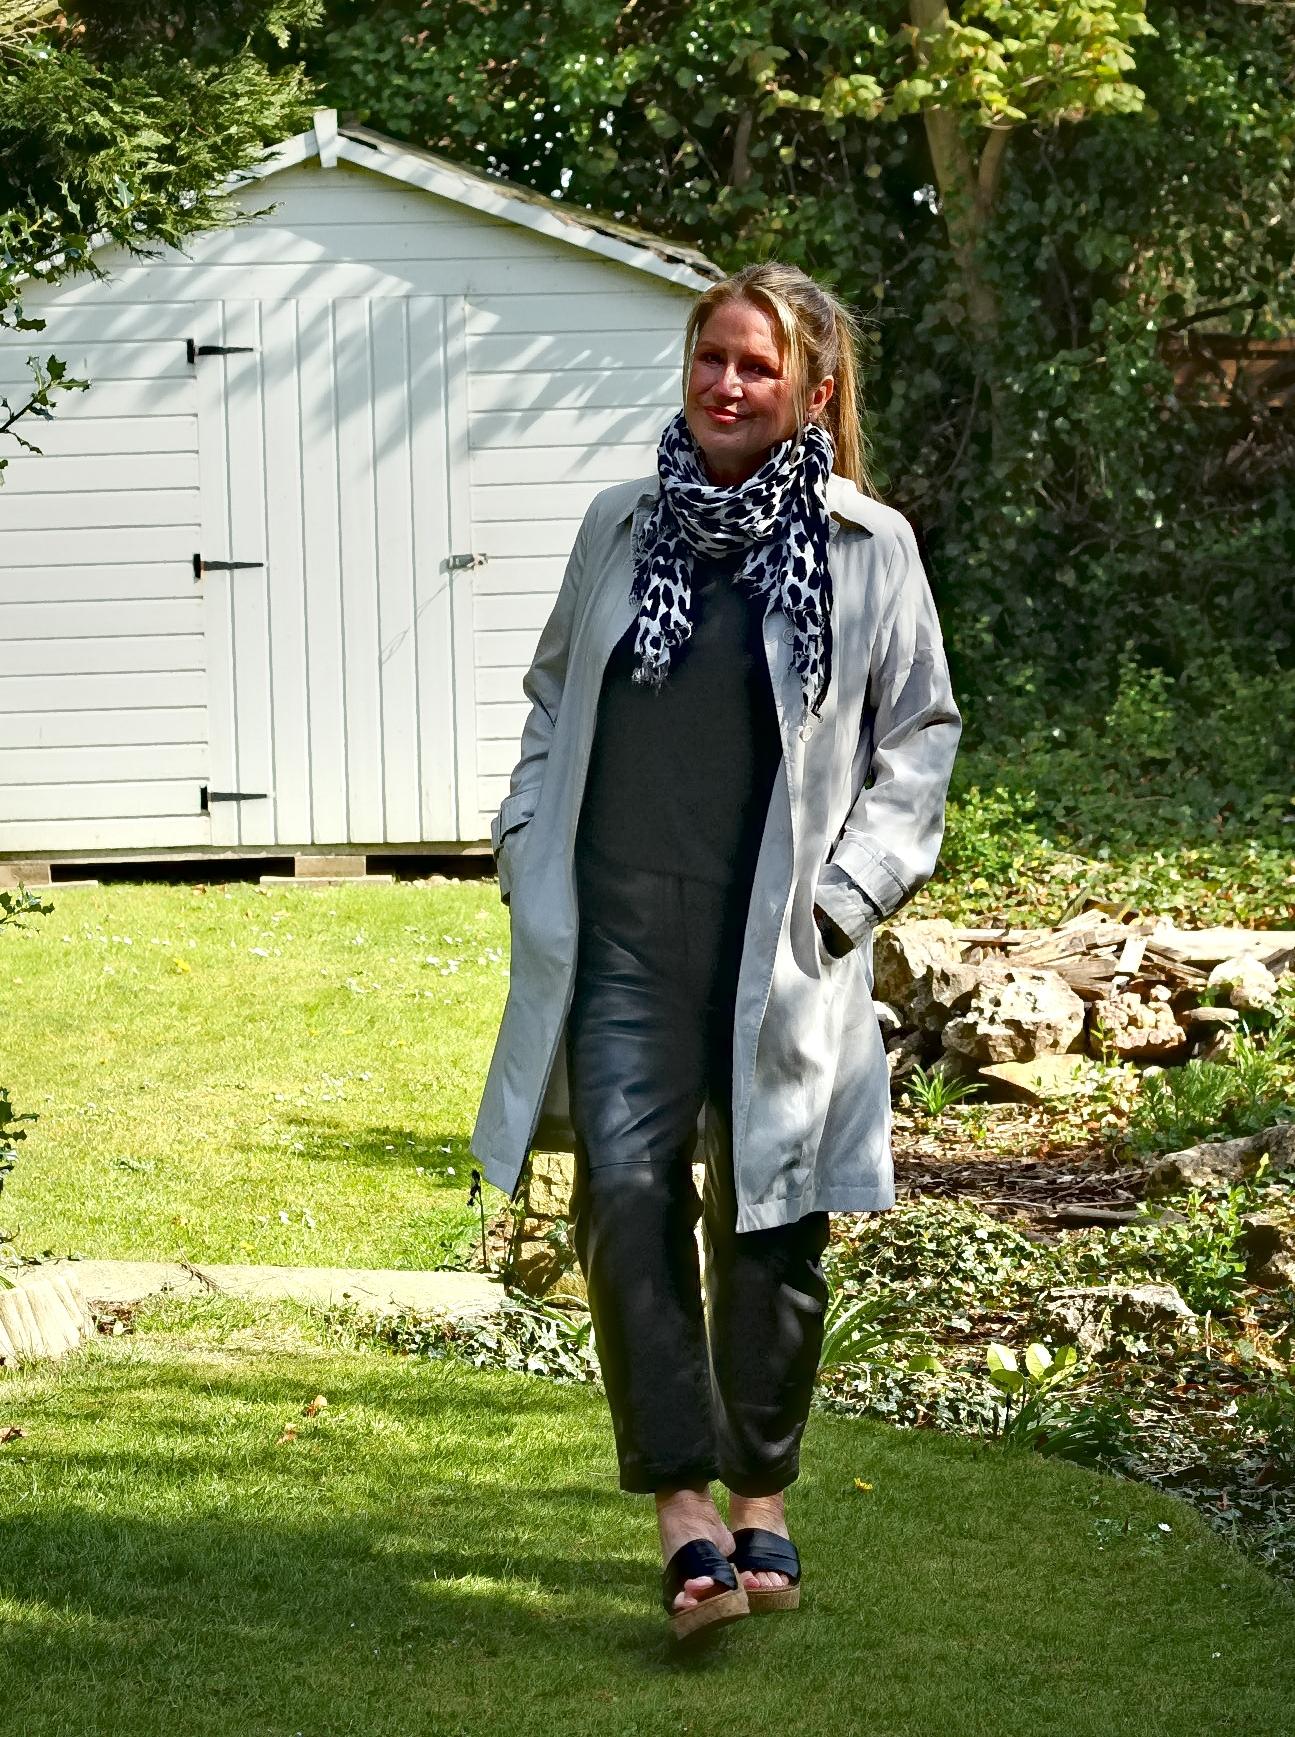 Feel-good fashion!!! What brings you joy?